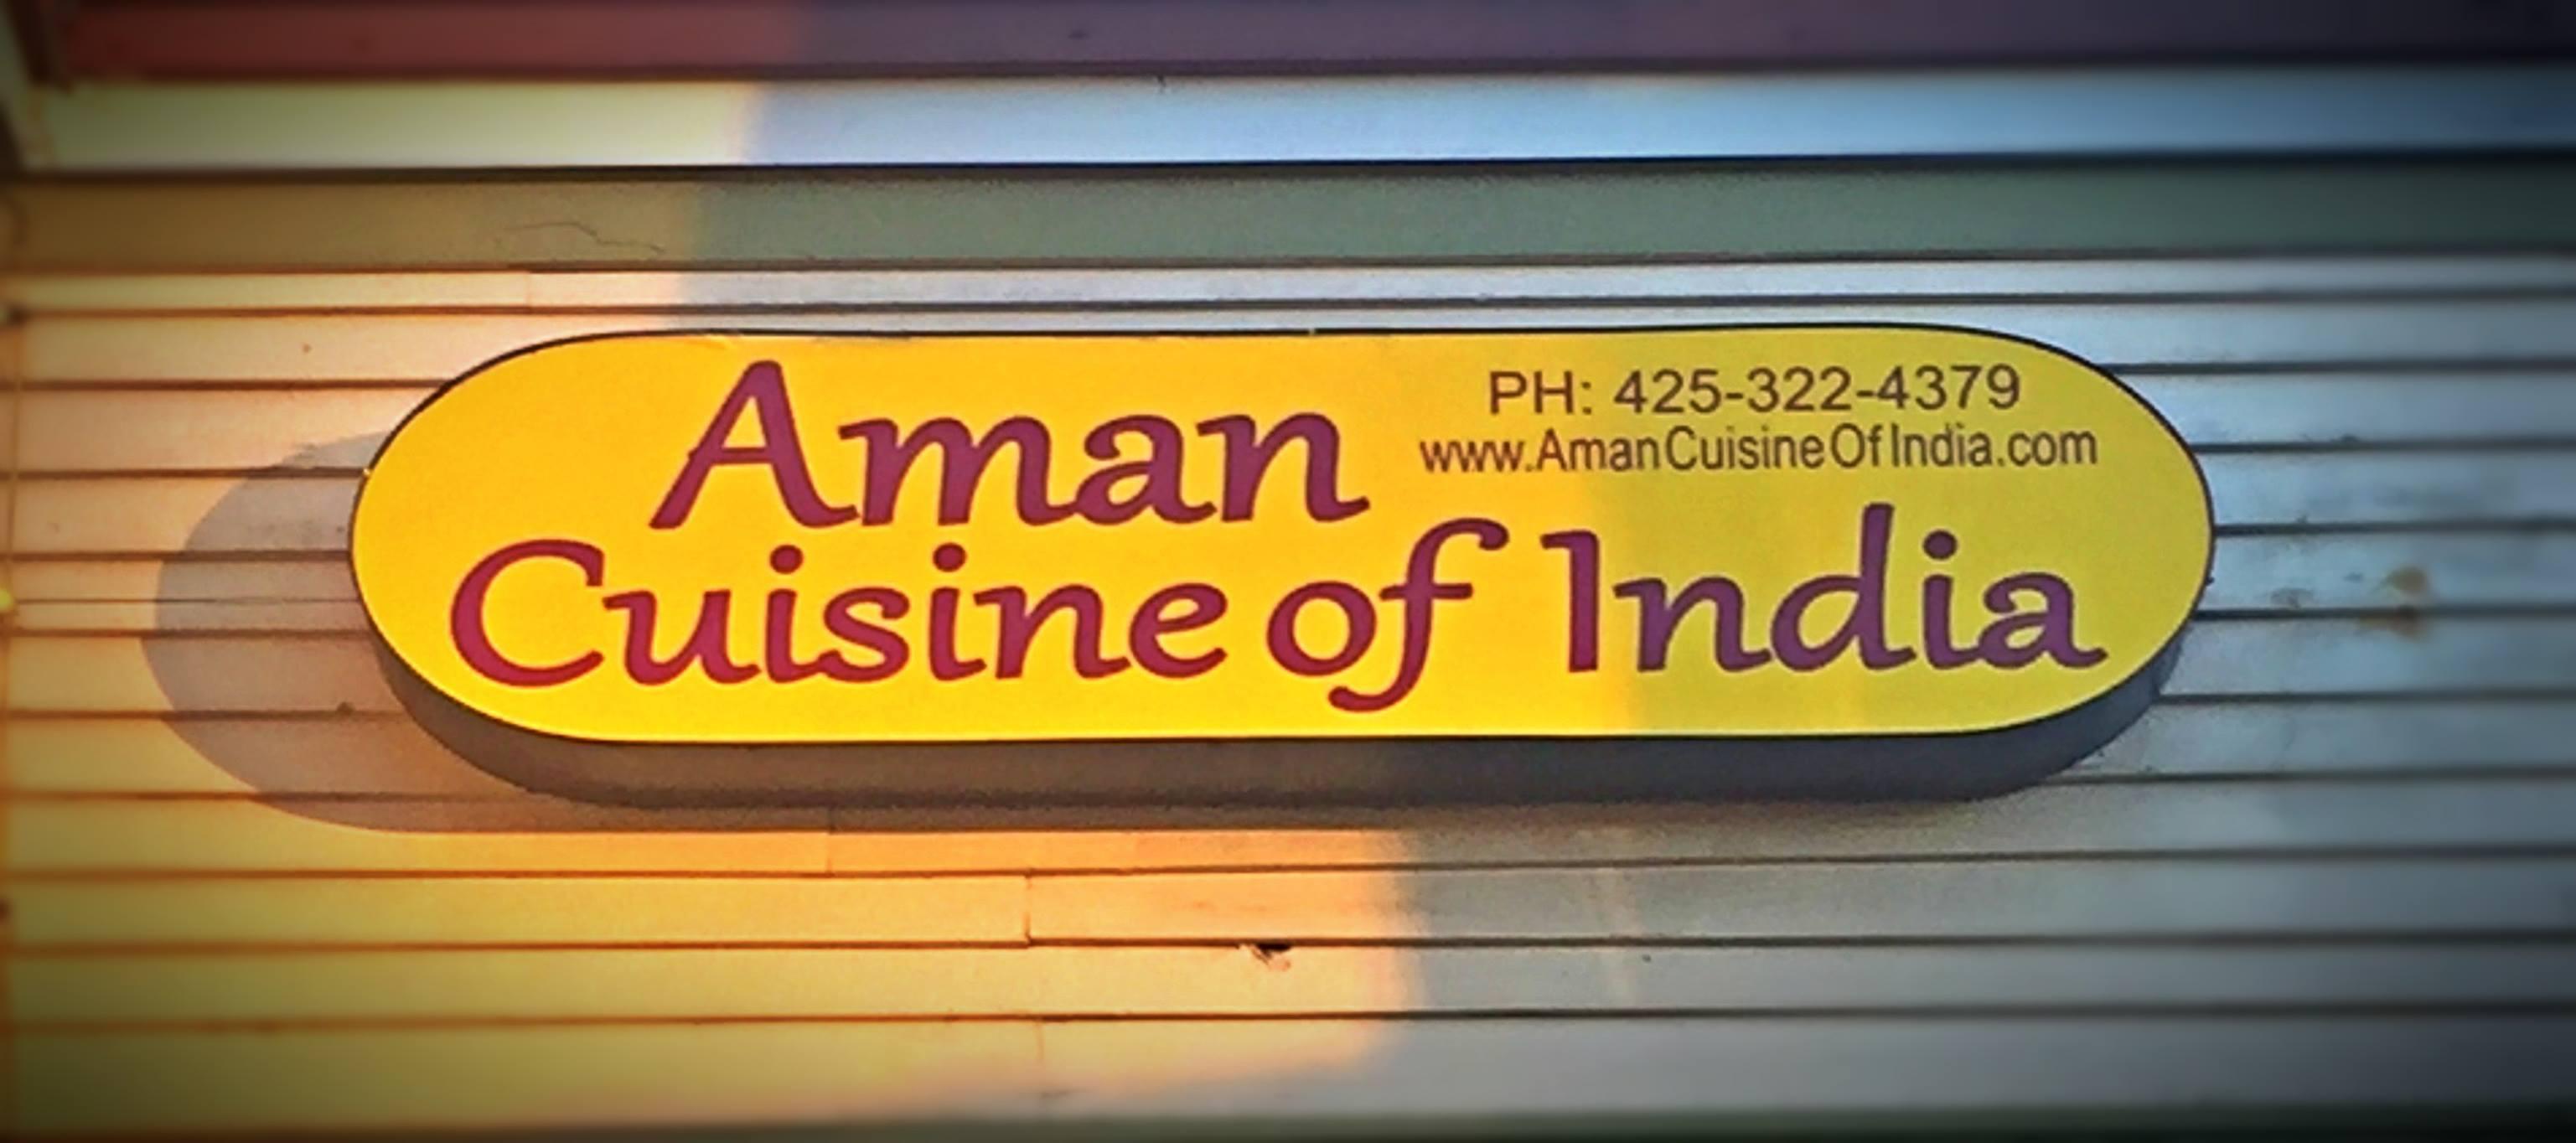 Restaurant news 39 dine around seattle 39 in edmonds plus for Aman indian cuisine